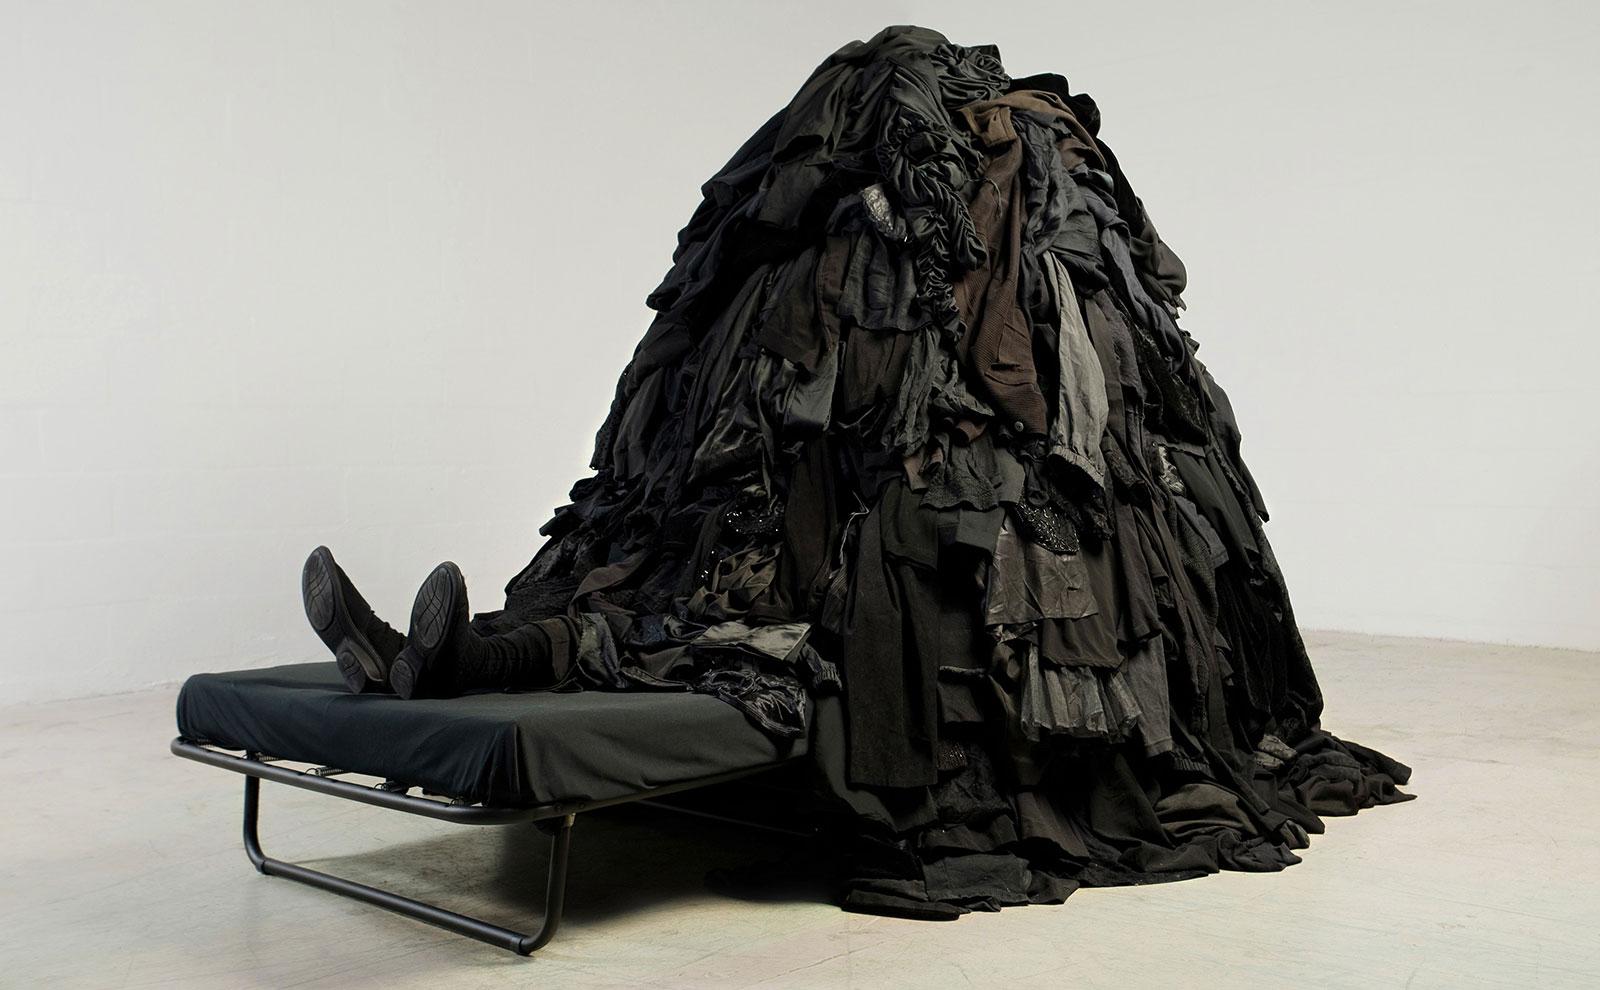 figurative sculpture under pile of discarded textiles